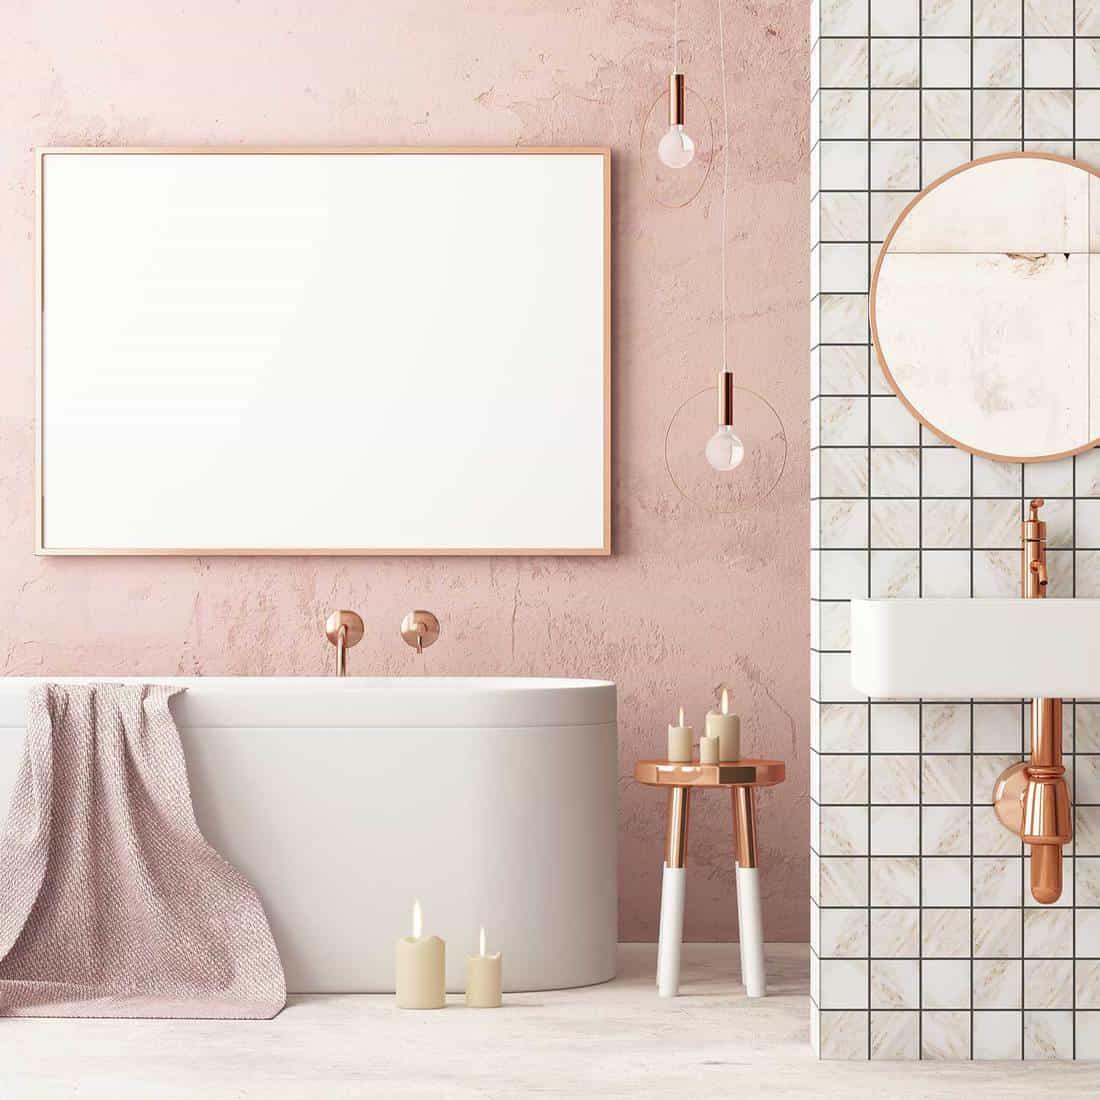 Interior of a bathroom in Art Deco style